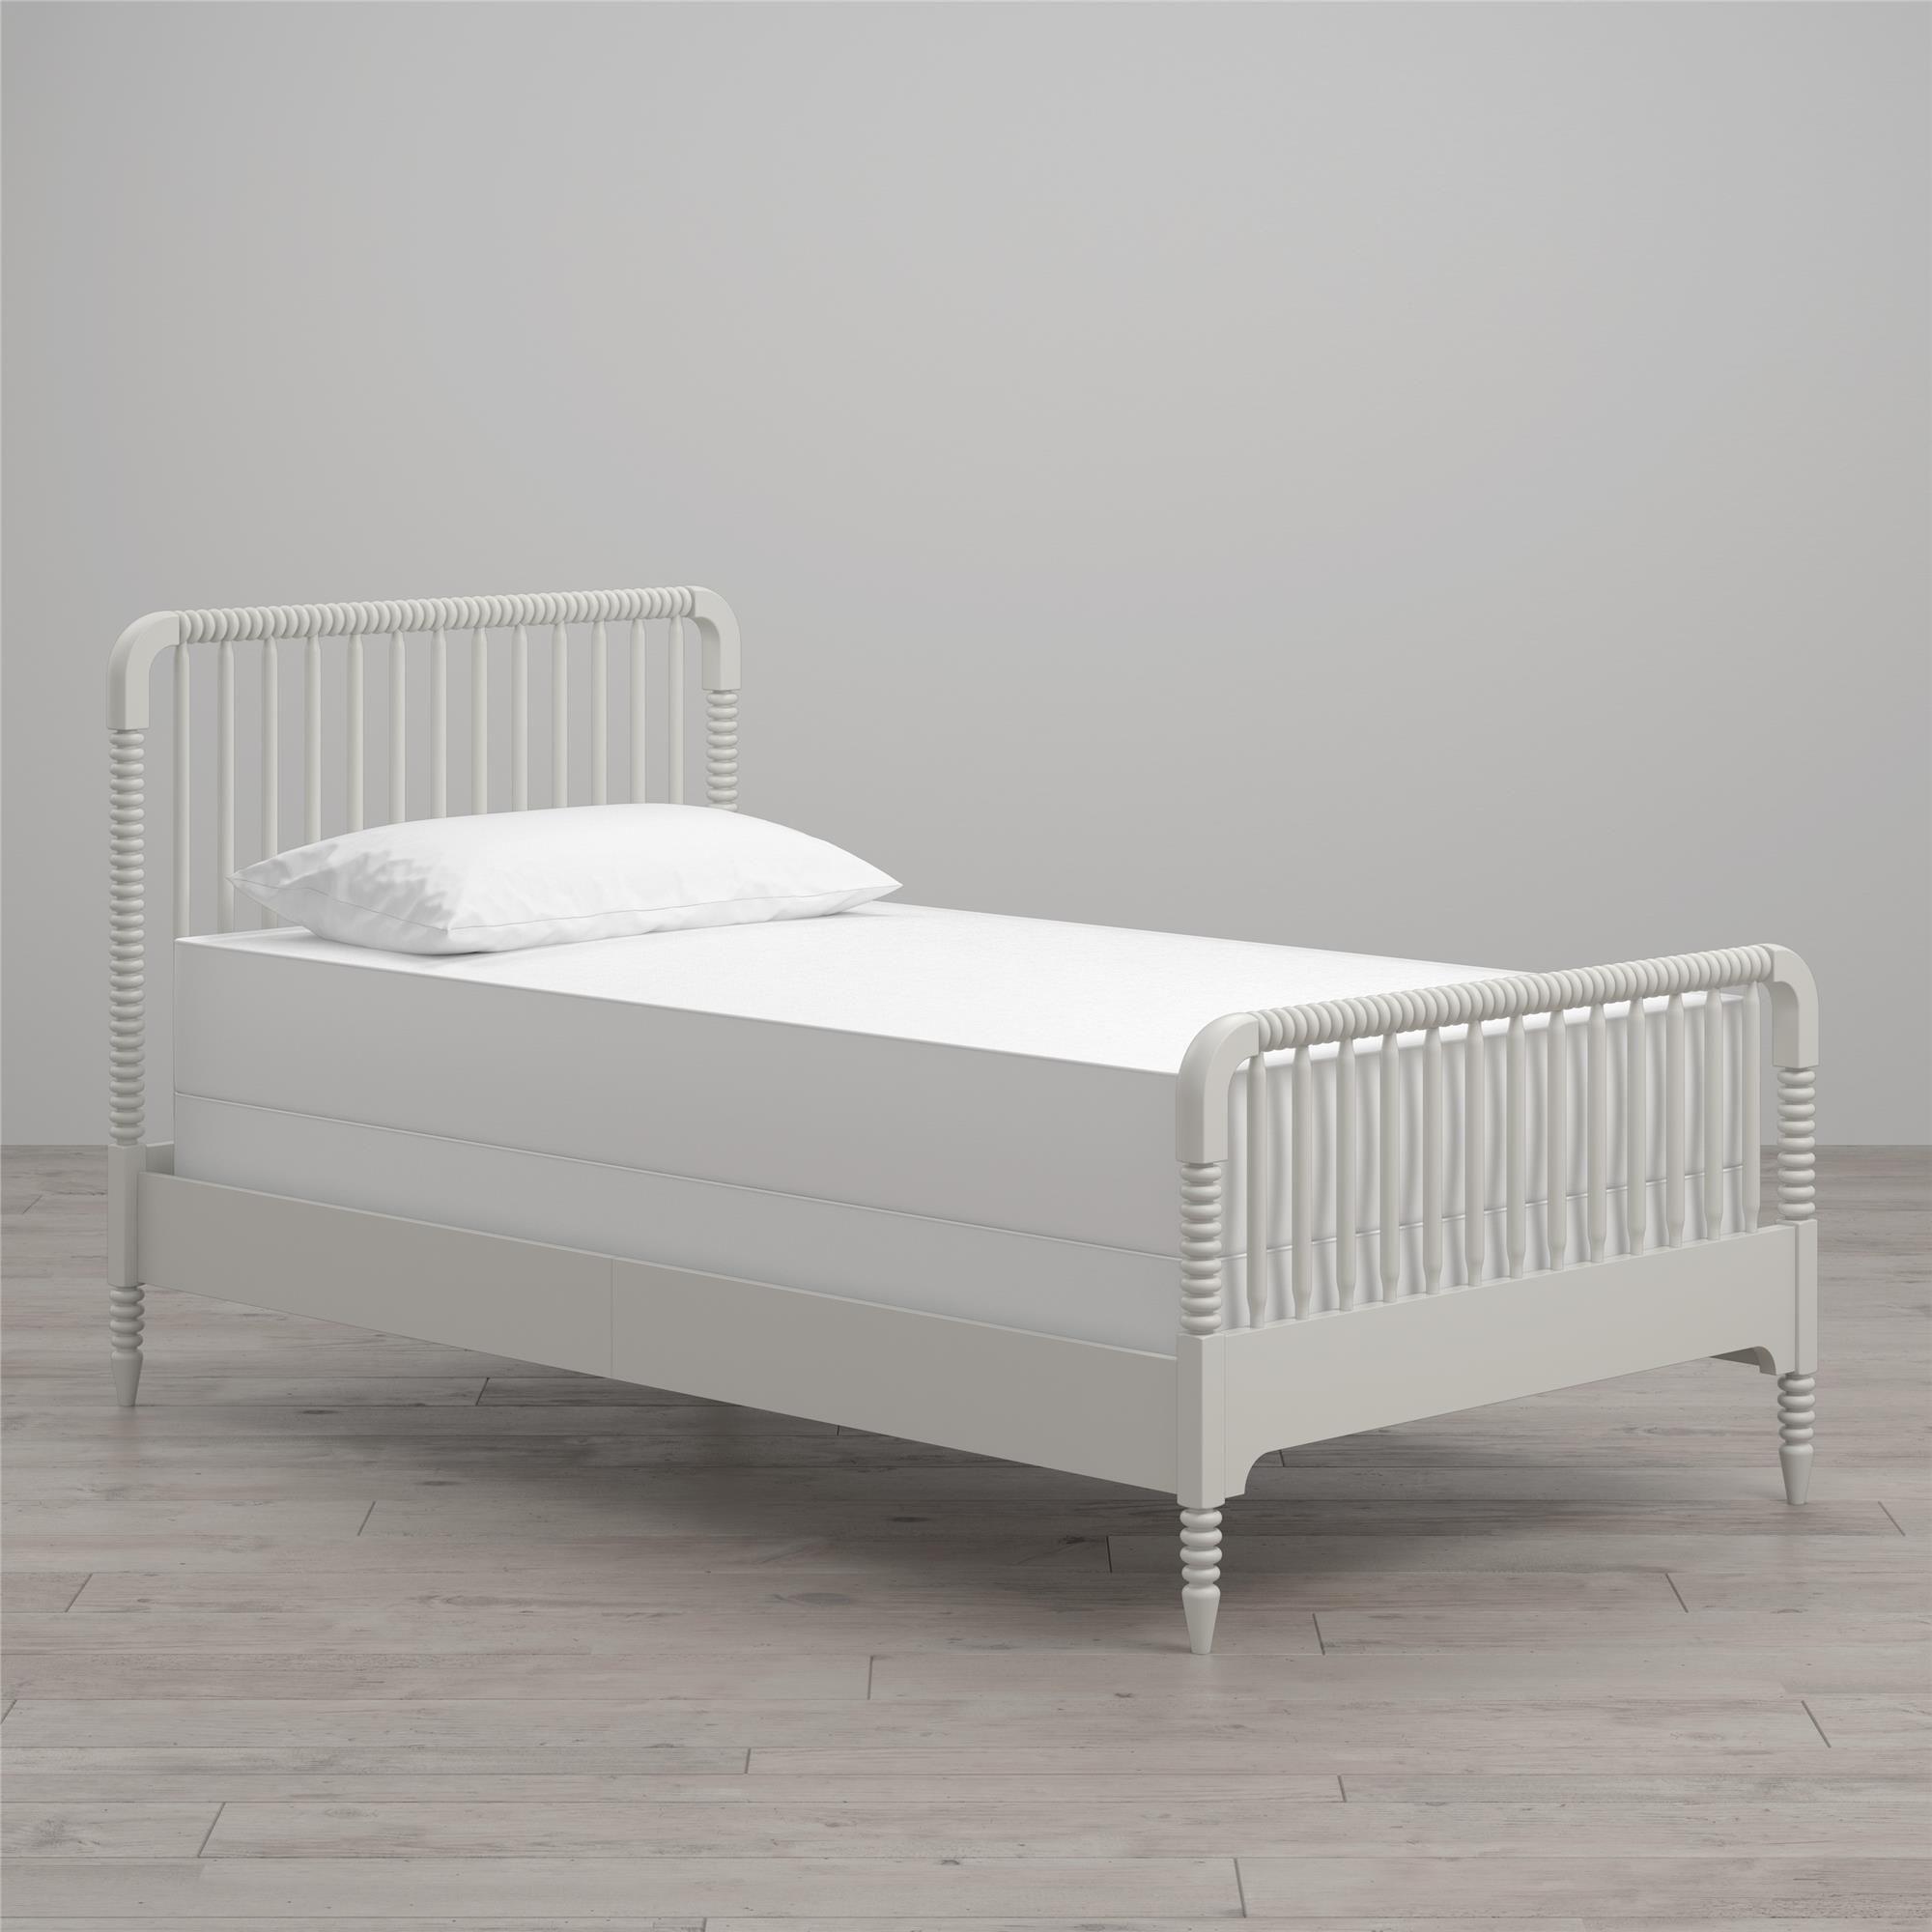 Home Bed, Bed slats, White bedding